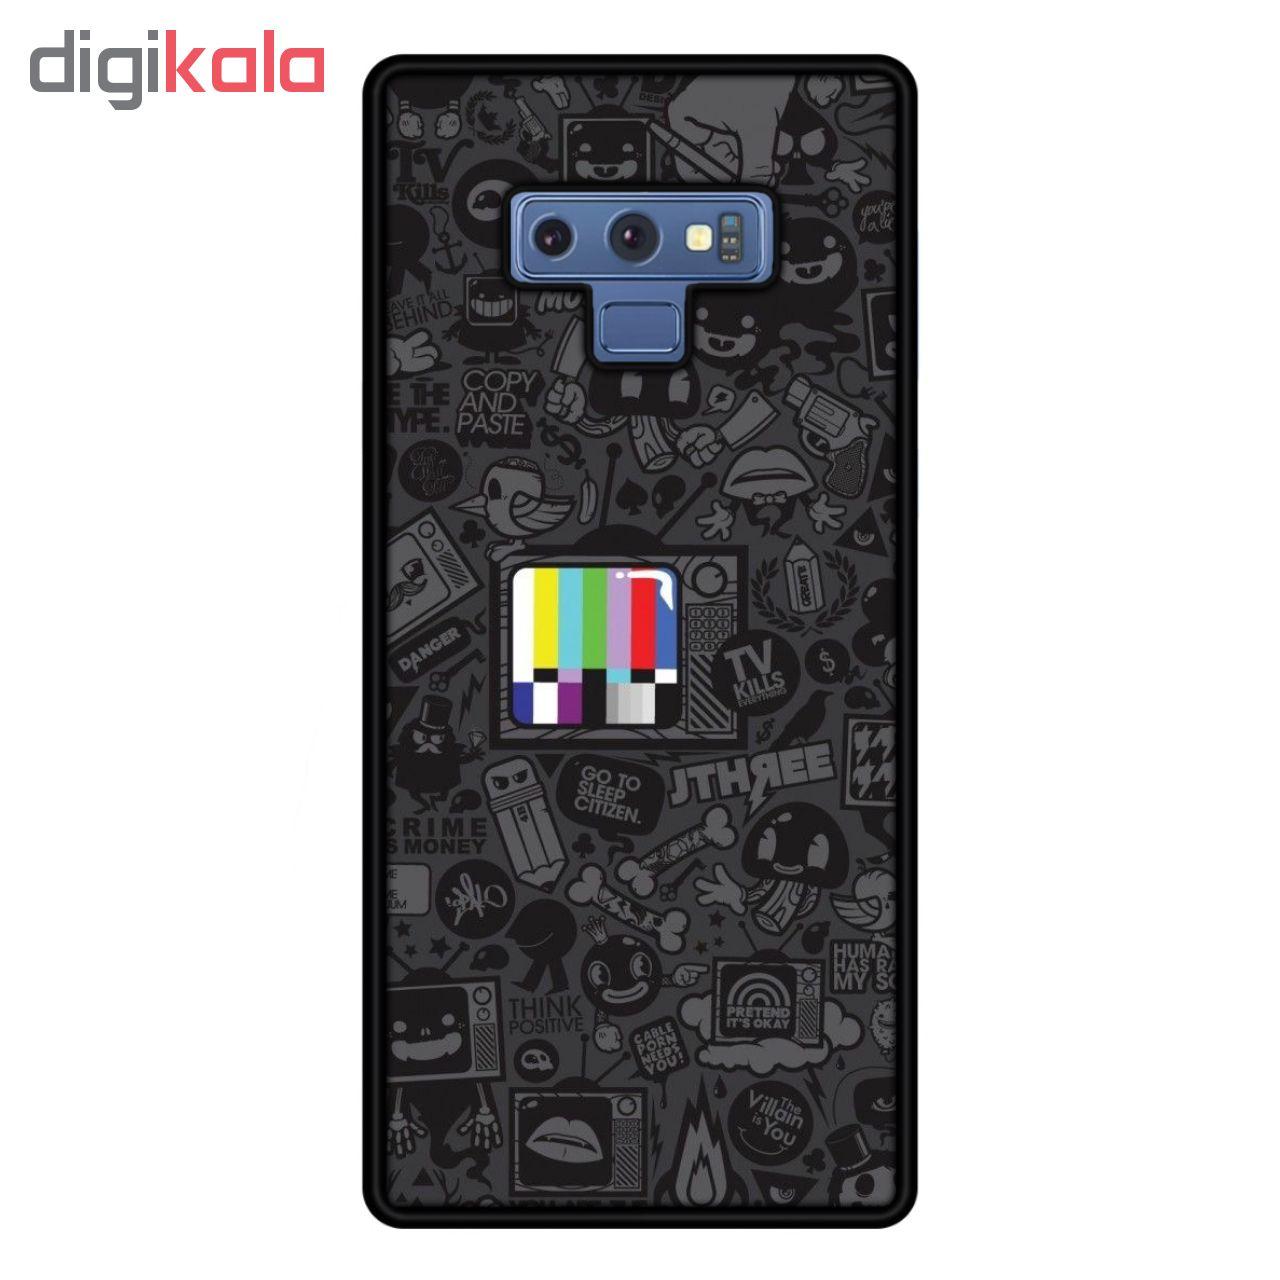 کاور آکام مدل AN90078 مناسب برای گوشی موبایل سامسونگ Galaxy Note 9 main 1 1